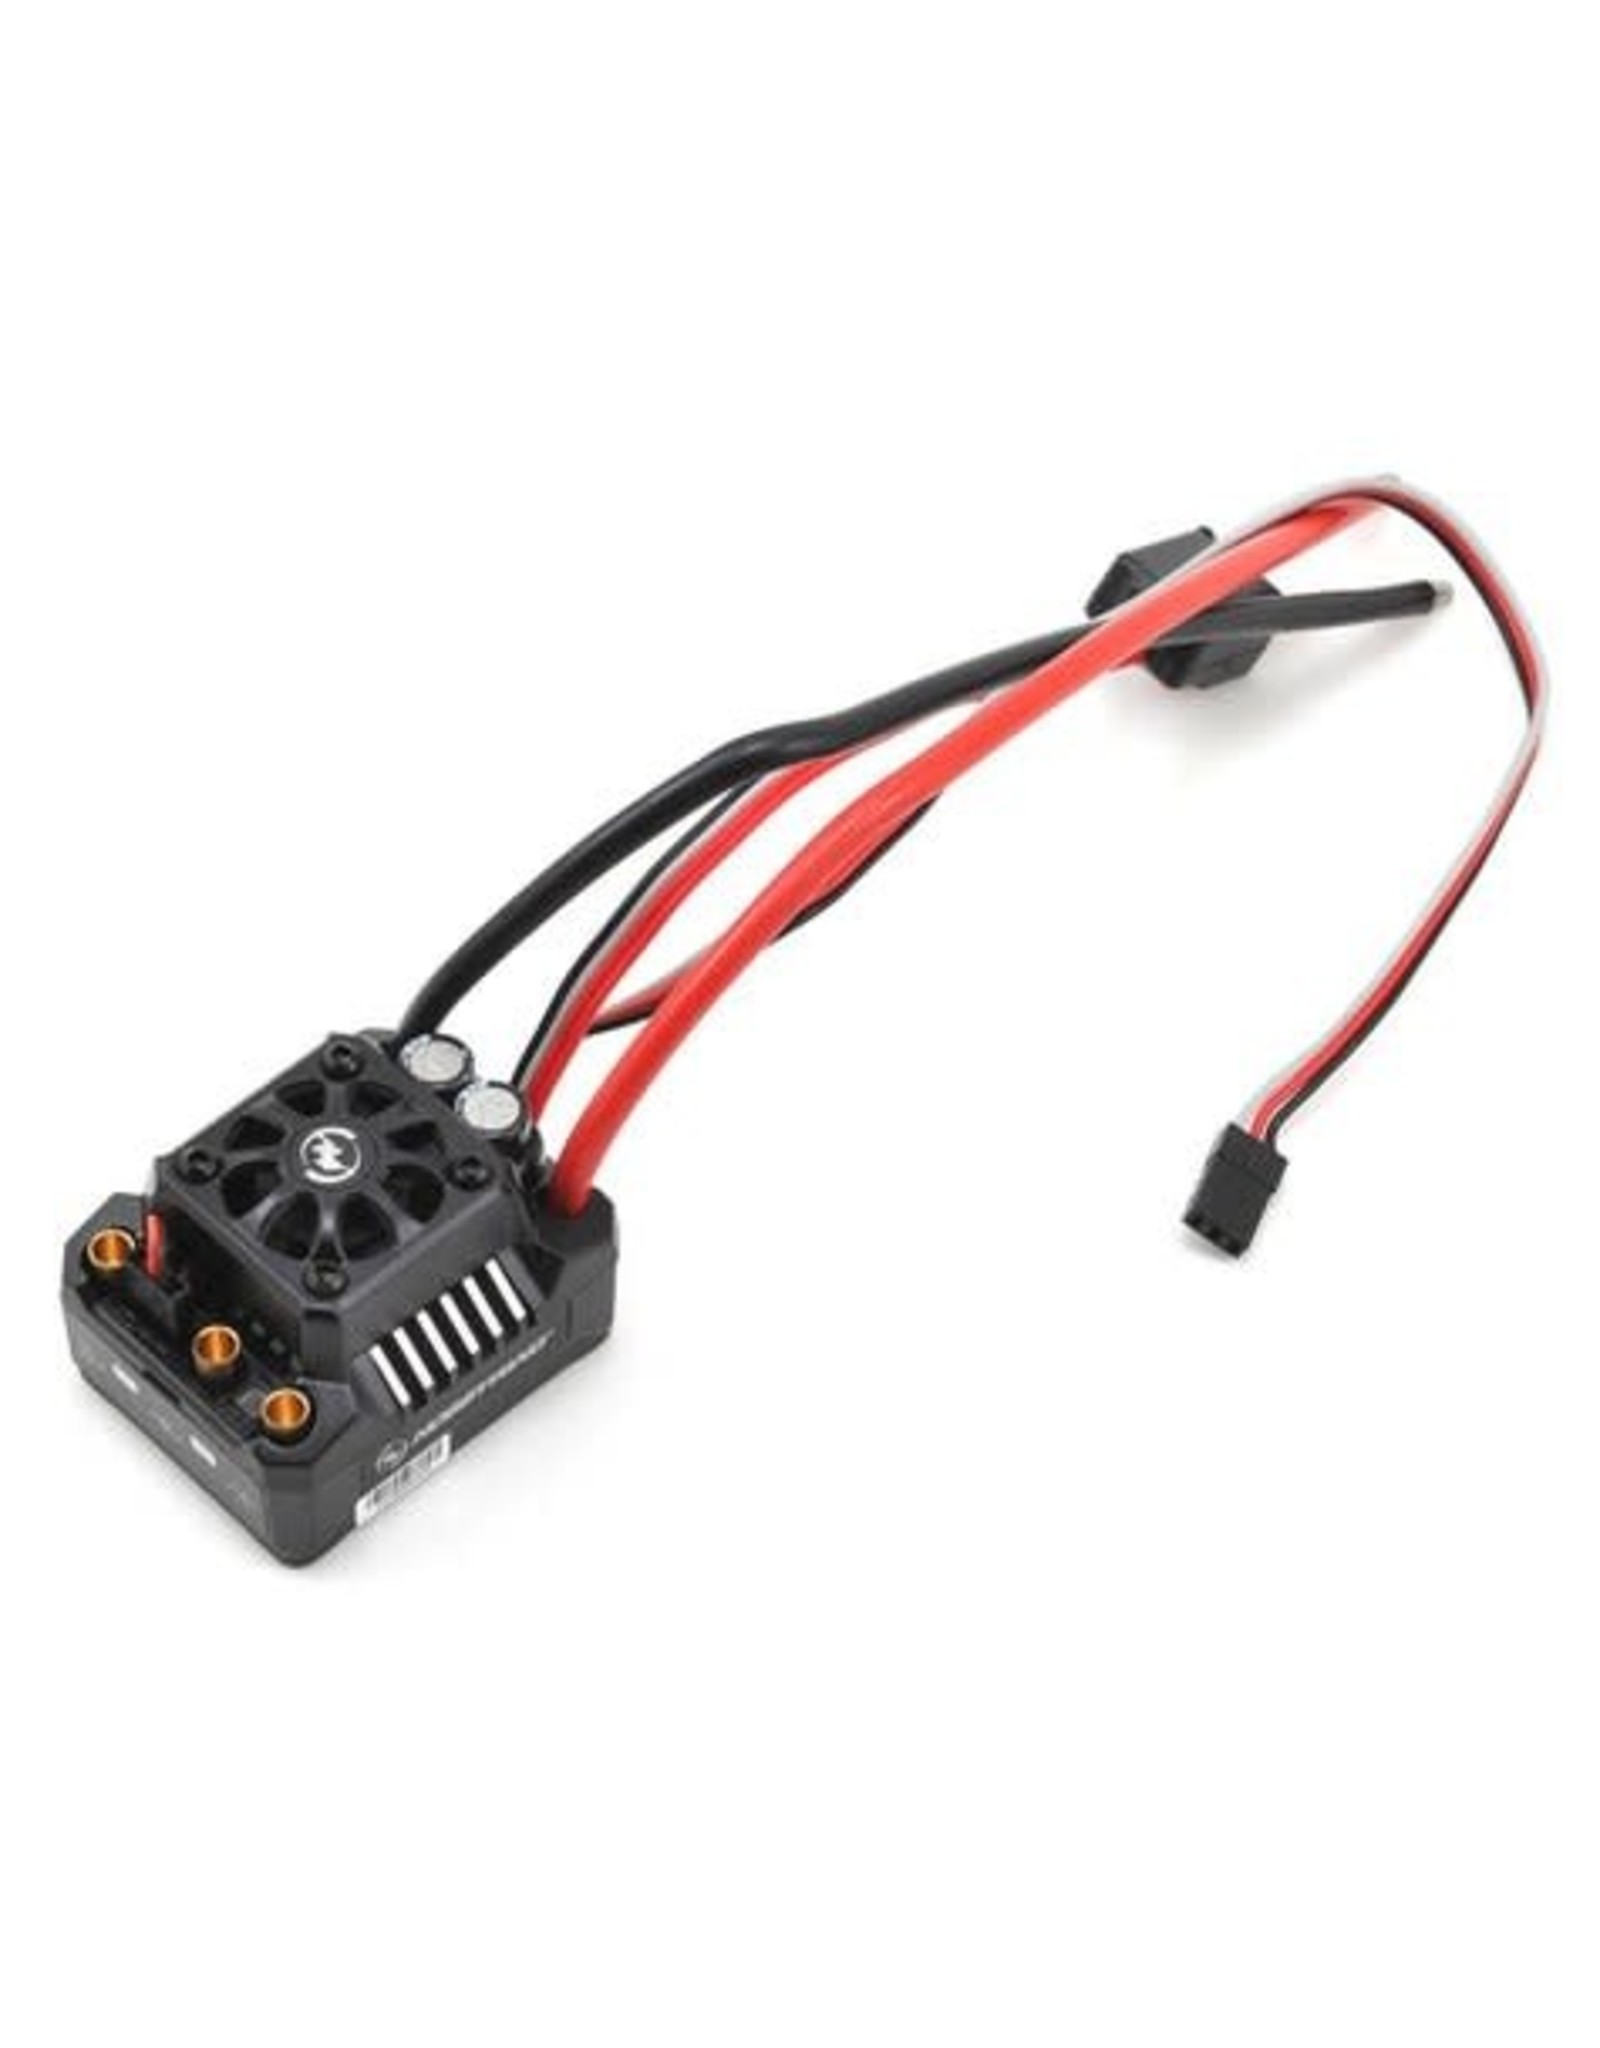 Hobbywing Hobbywing EZRun MAX10 SCT 120A Waterproof Sensorless Brushless ESC